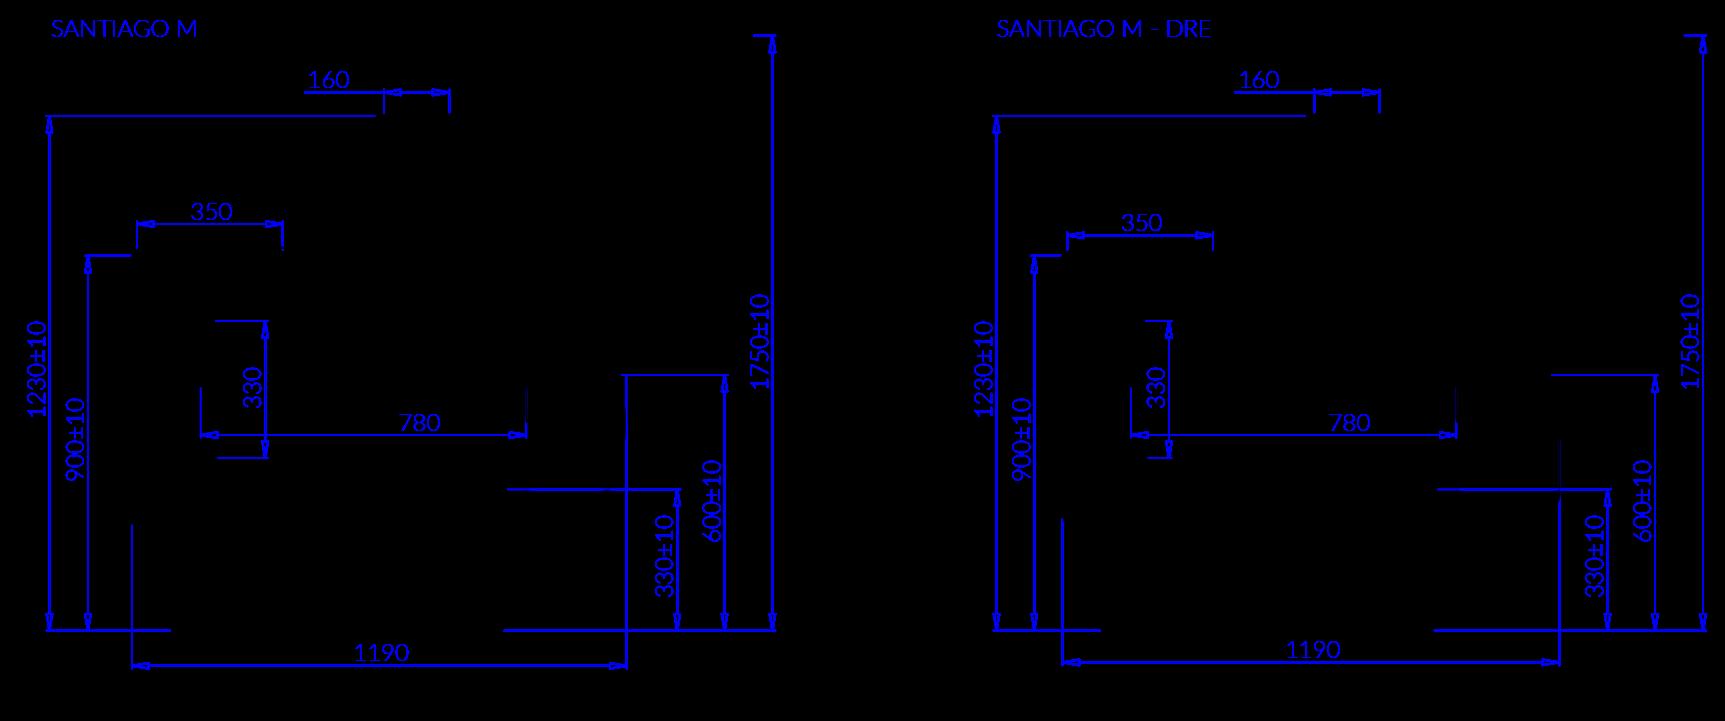 Rysunek techniczny SANTIAGO M